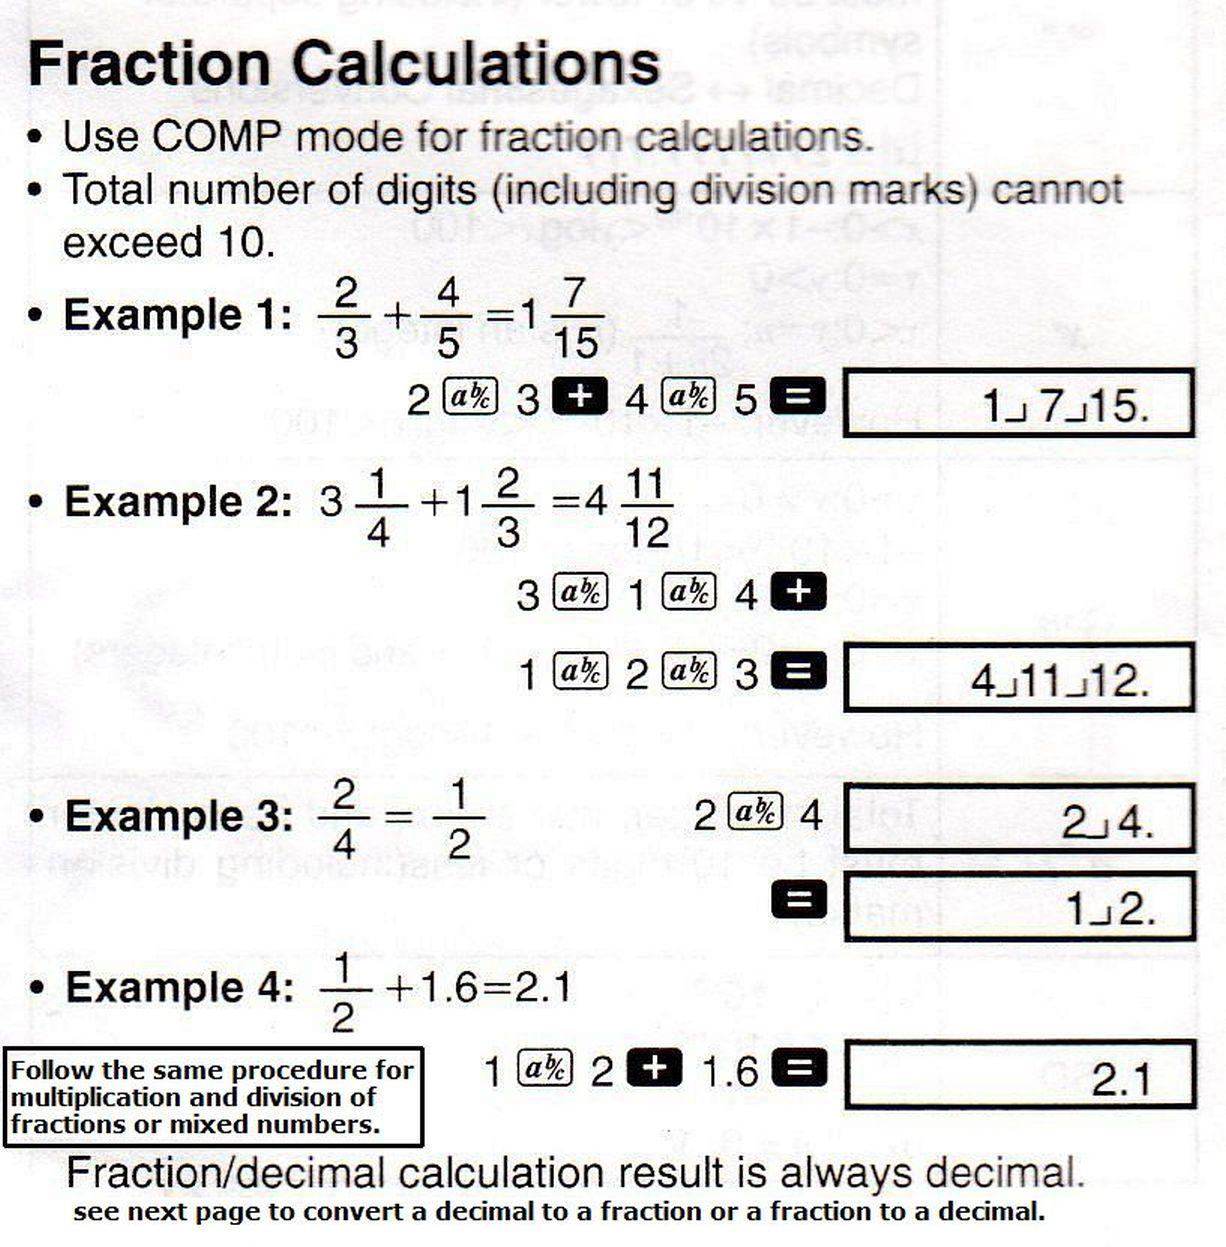 Cobb Adult Ed Math Using The Casio Fx 260 Solar Calculator On The Ged Exam